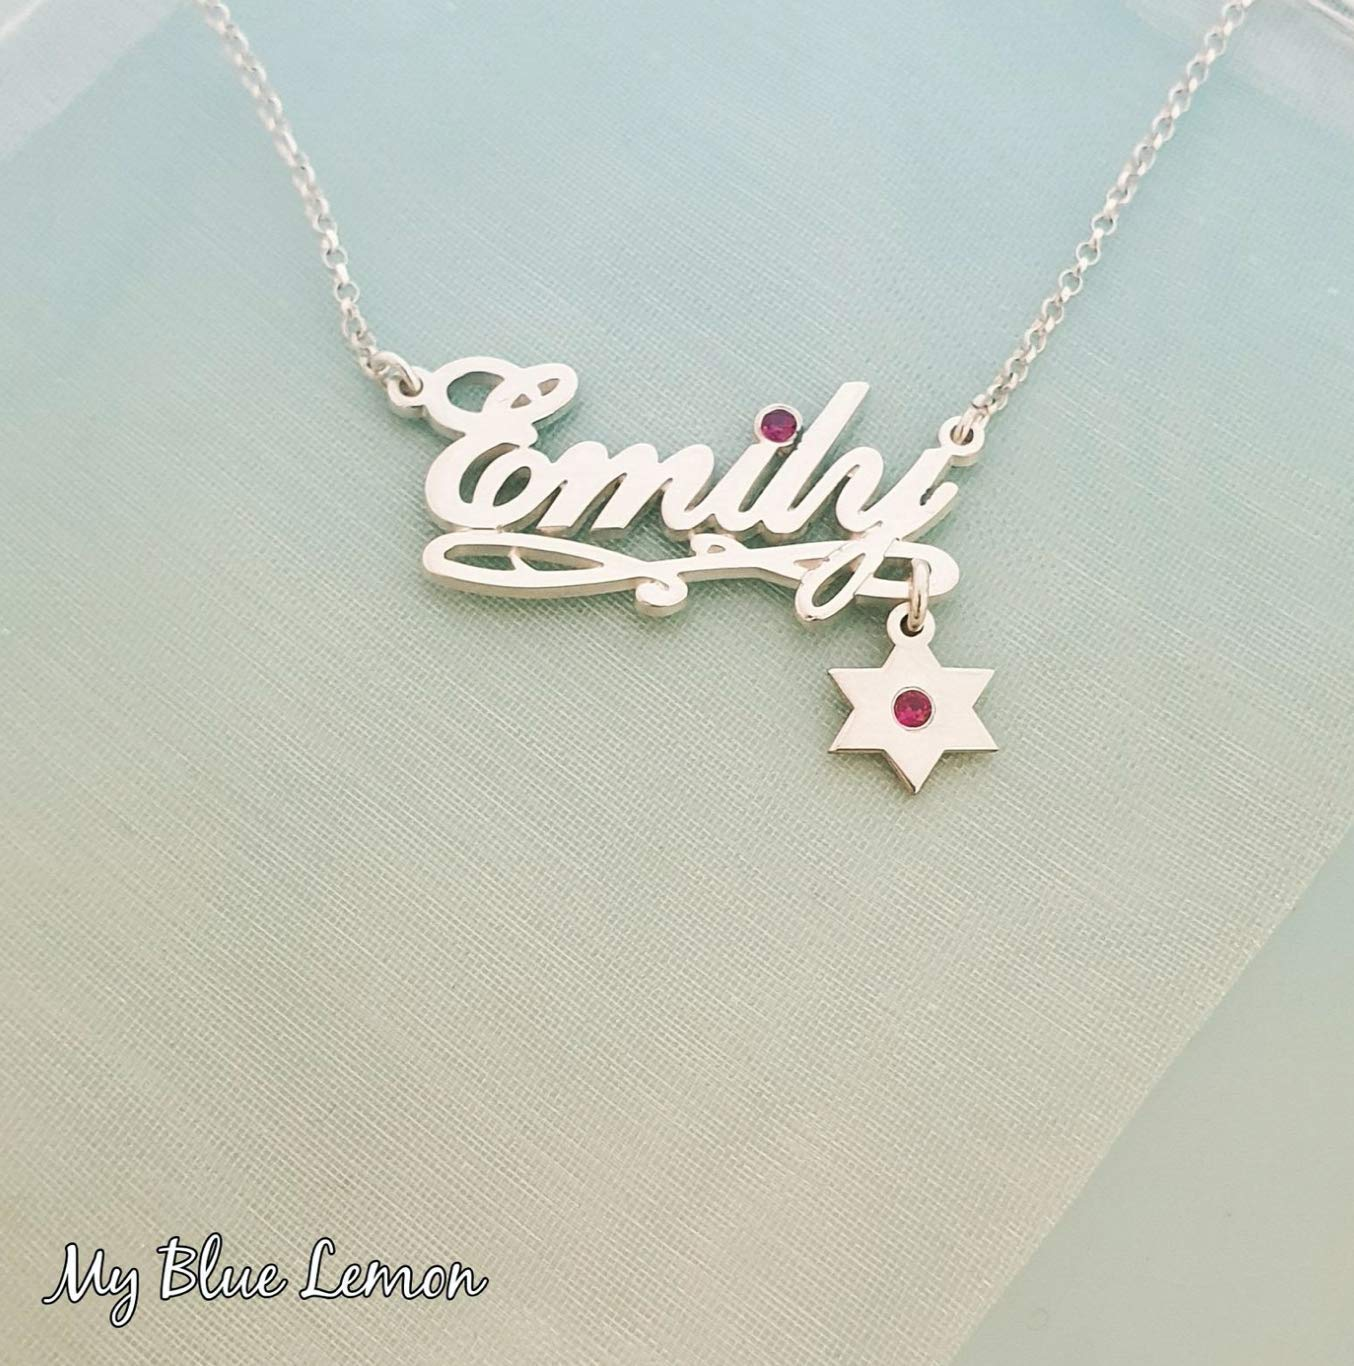 Personalized Natalie Name Necklace With Star Of David Charm Birthstone Swarovski Birthstone Order Any Name Jewelry Custom Bat Mitzvah Jewish Star